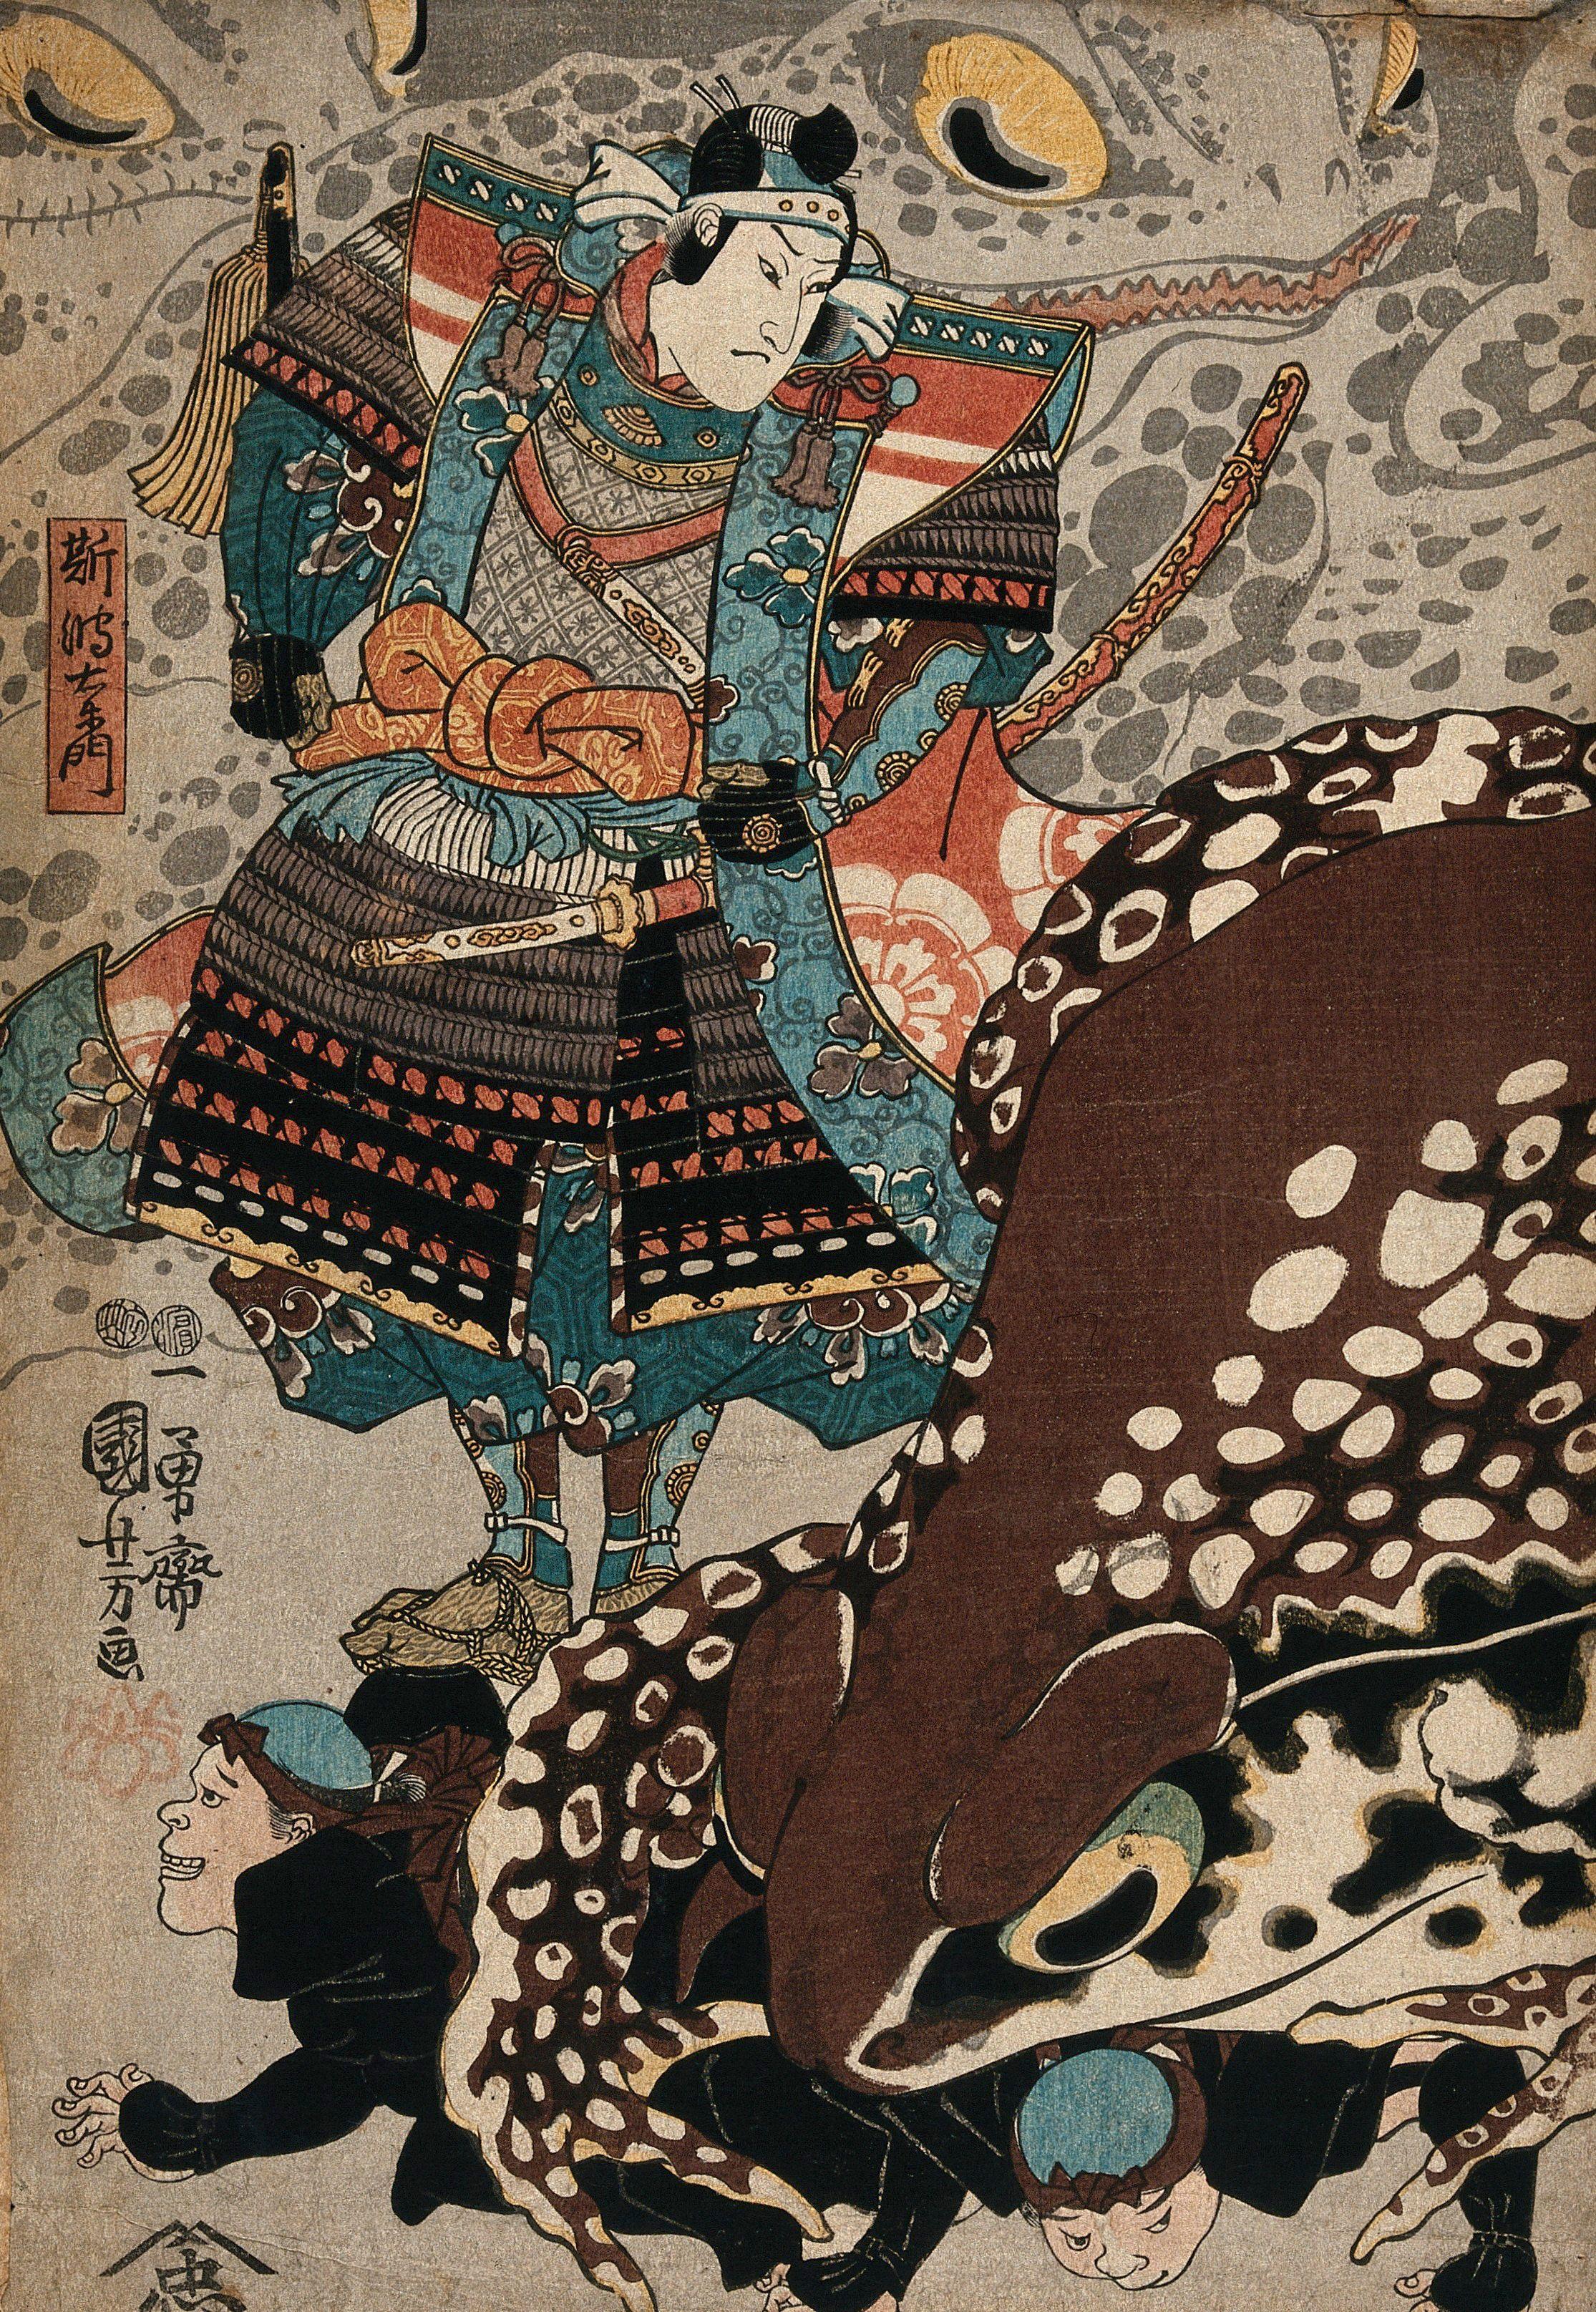 A Samurai Looks On As A Giant Frog Runs Over The Menials Colour Woodcut By Kuniyoshi 1847 1848 Wellcome Collection